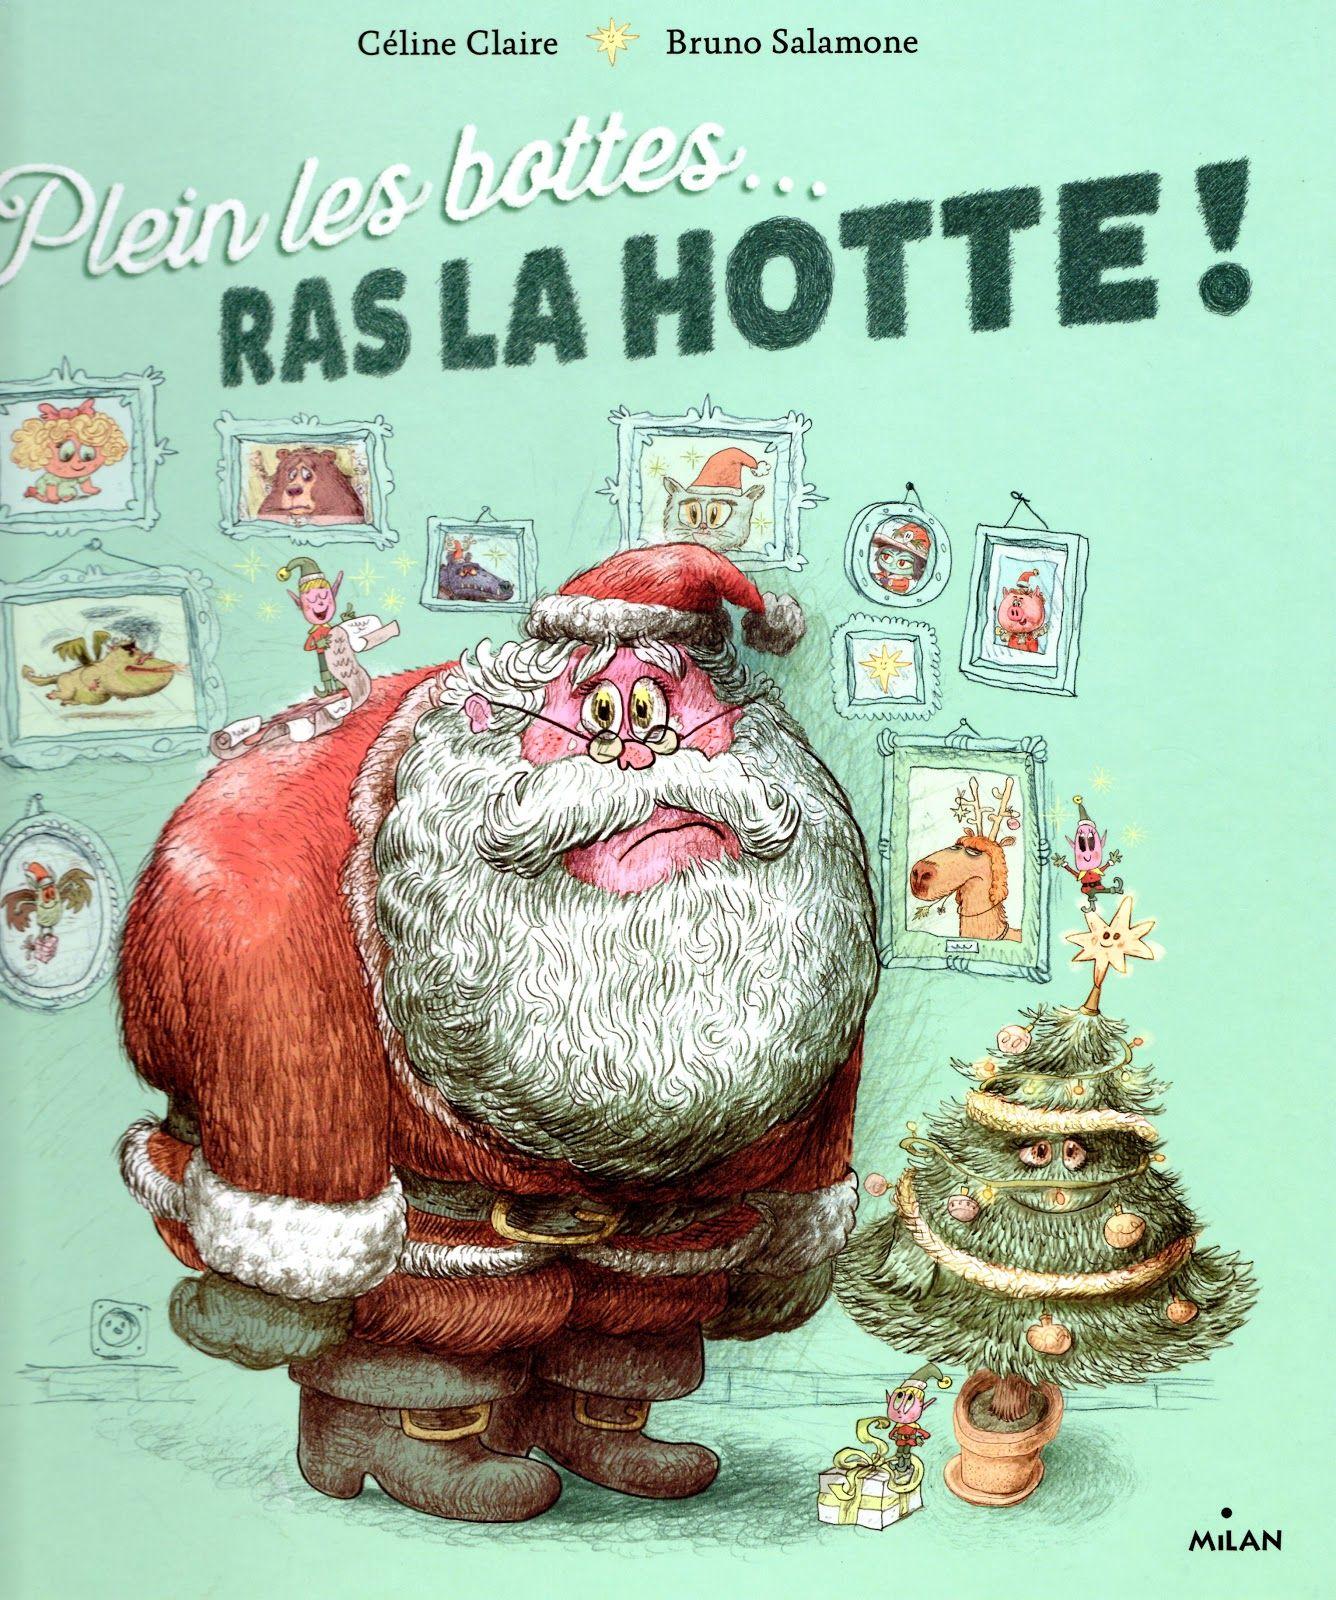 Noel Botte Hotte20171030 Jpg Album Noel Kobo